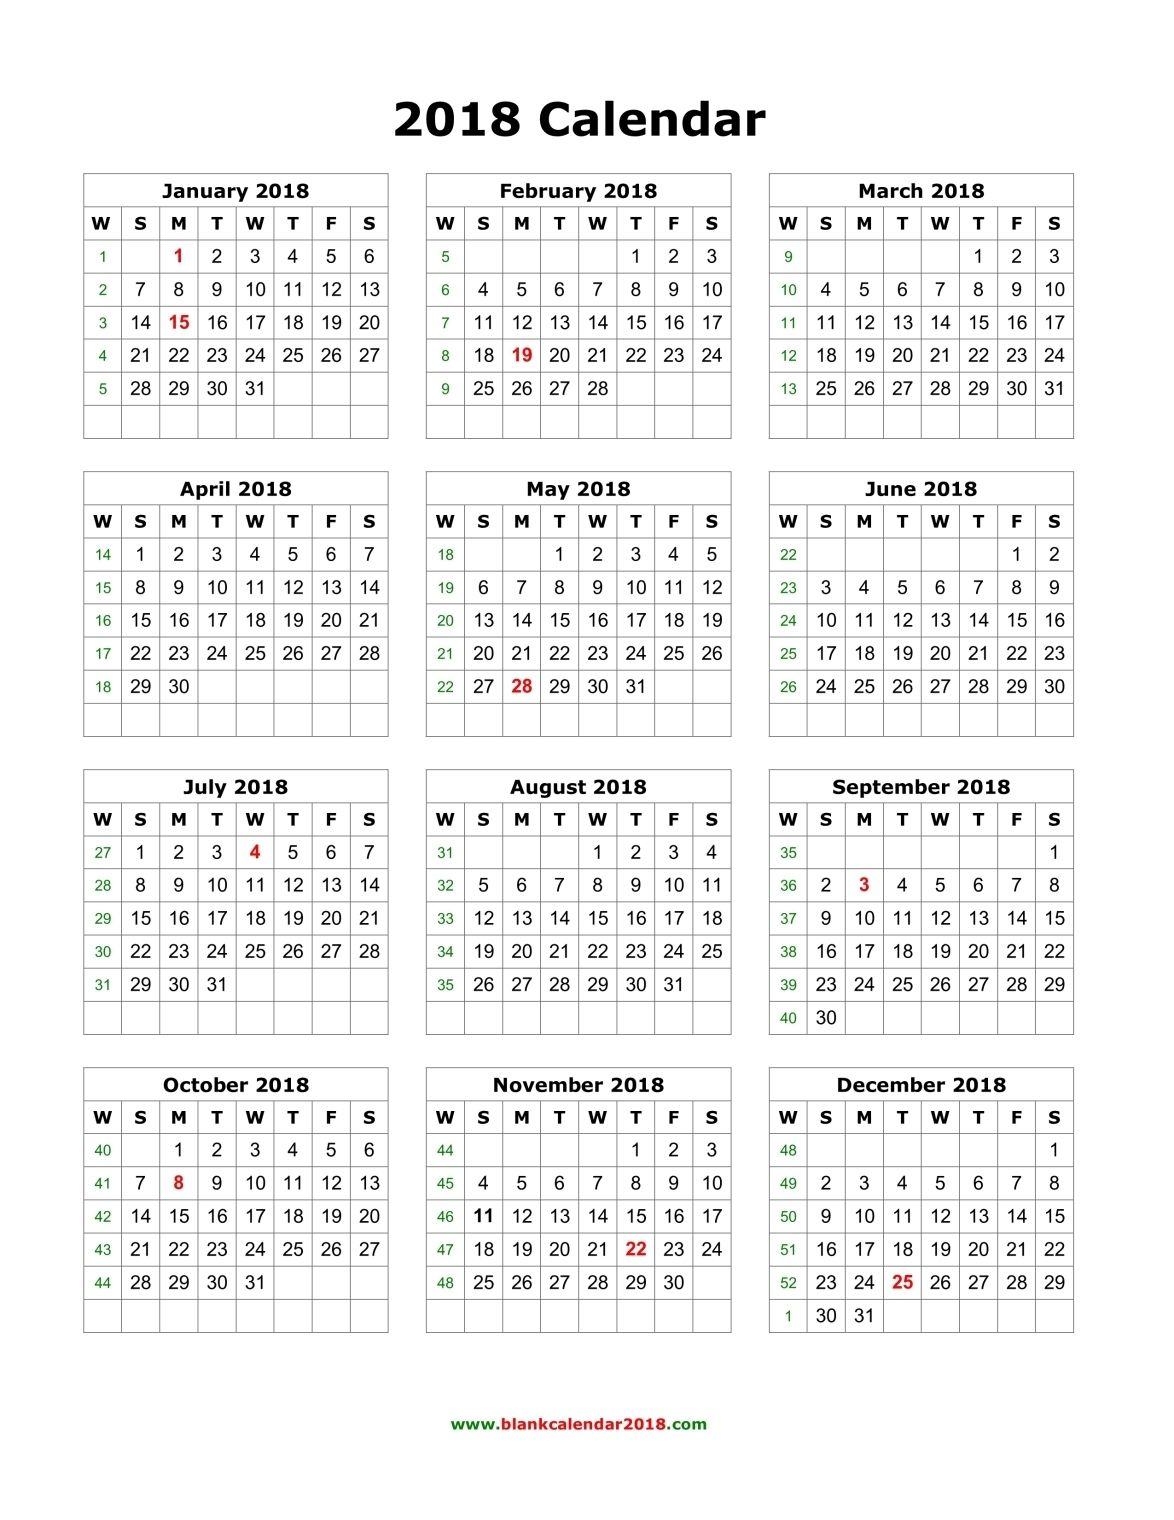 2018 calendar printable with holidays